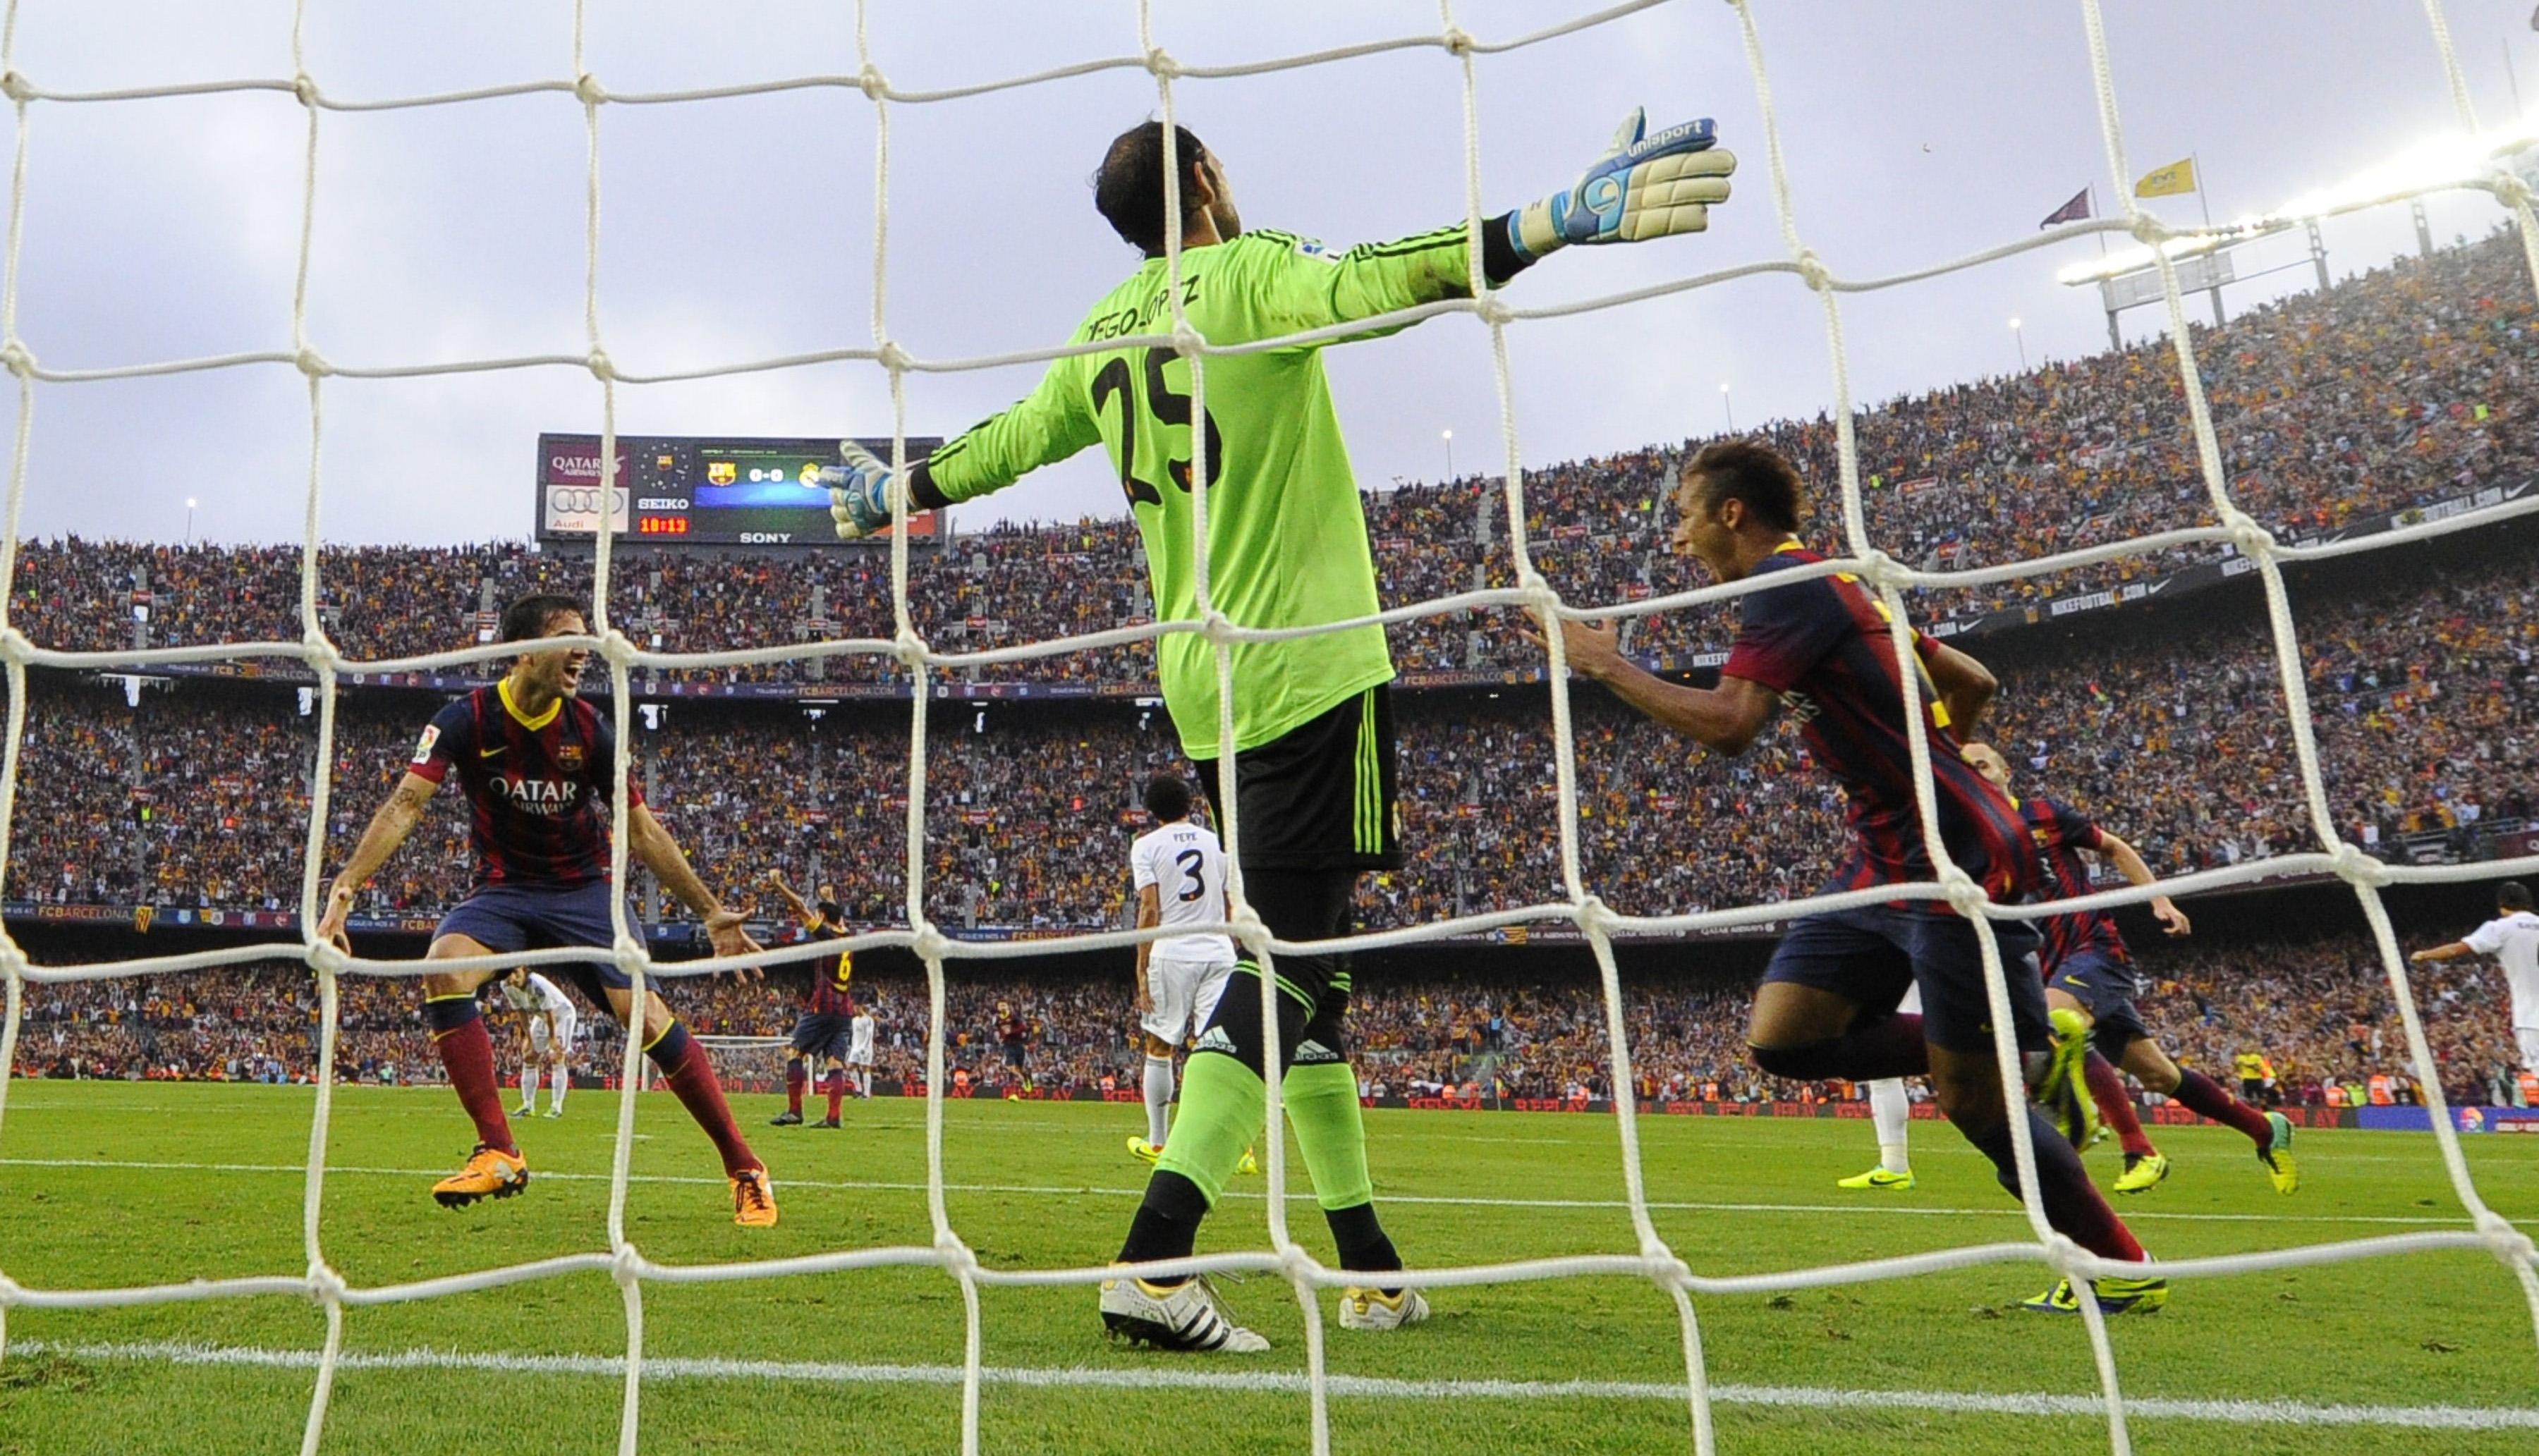 Barcelona vs Real Madrid: ¿a qué hora se juega el